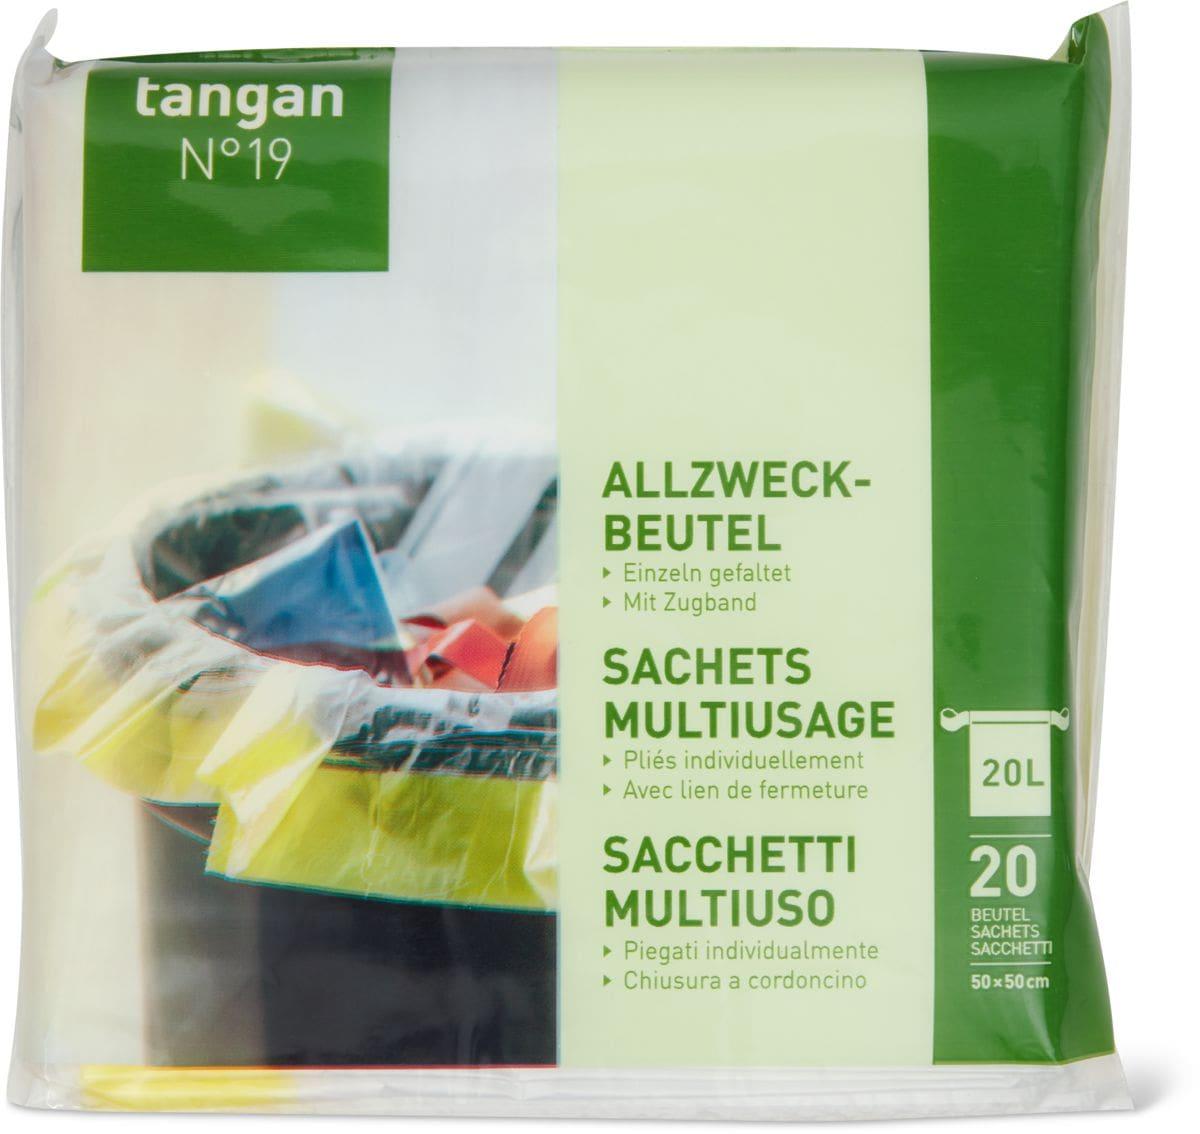 Tangan N°19 Sachets Multiusage 20l